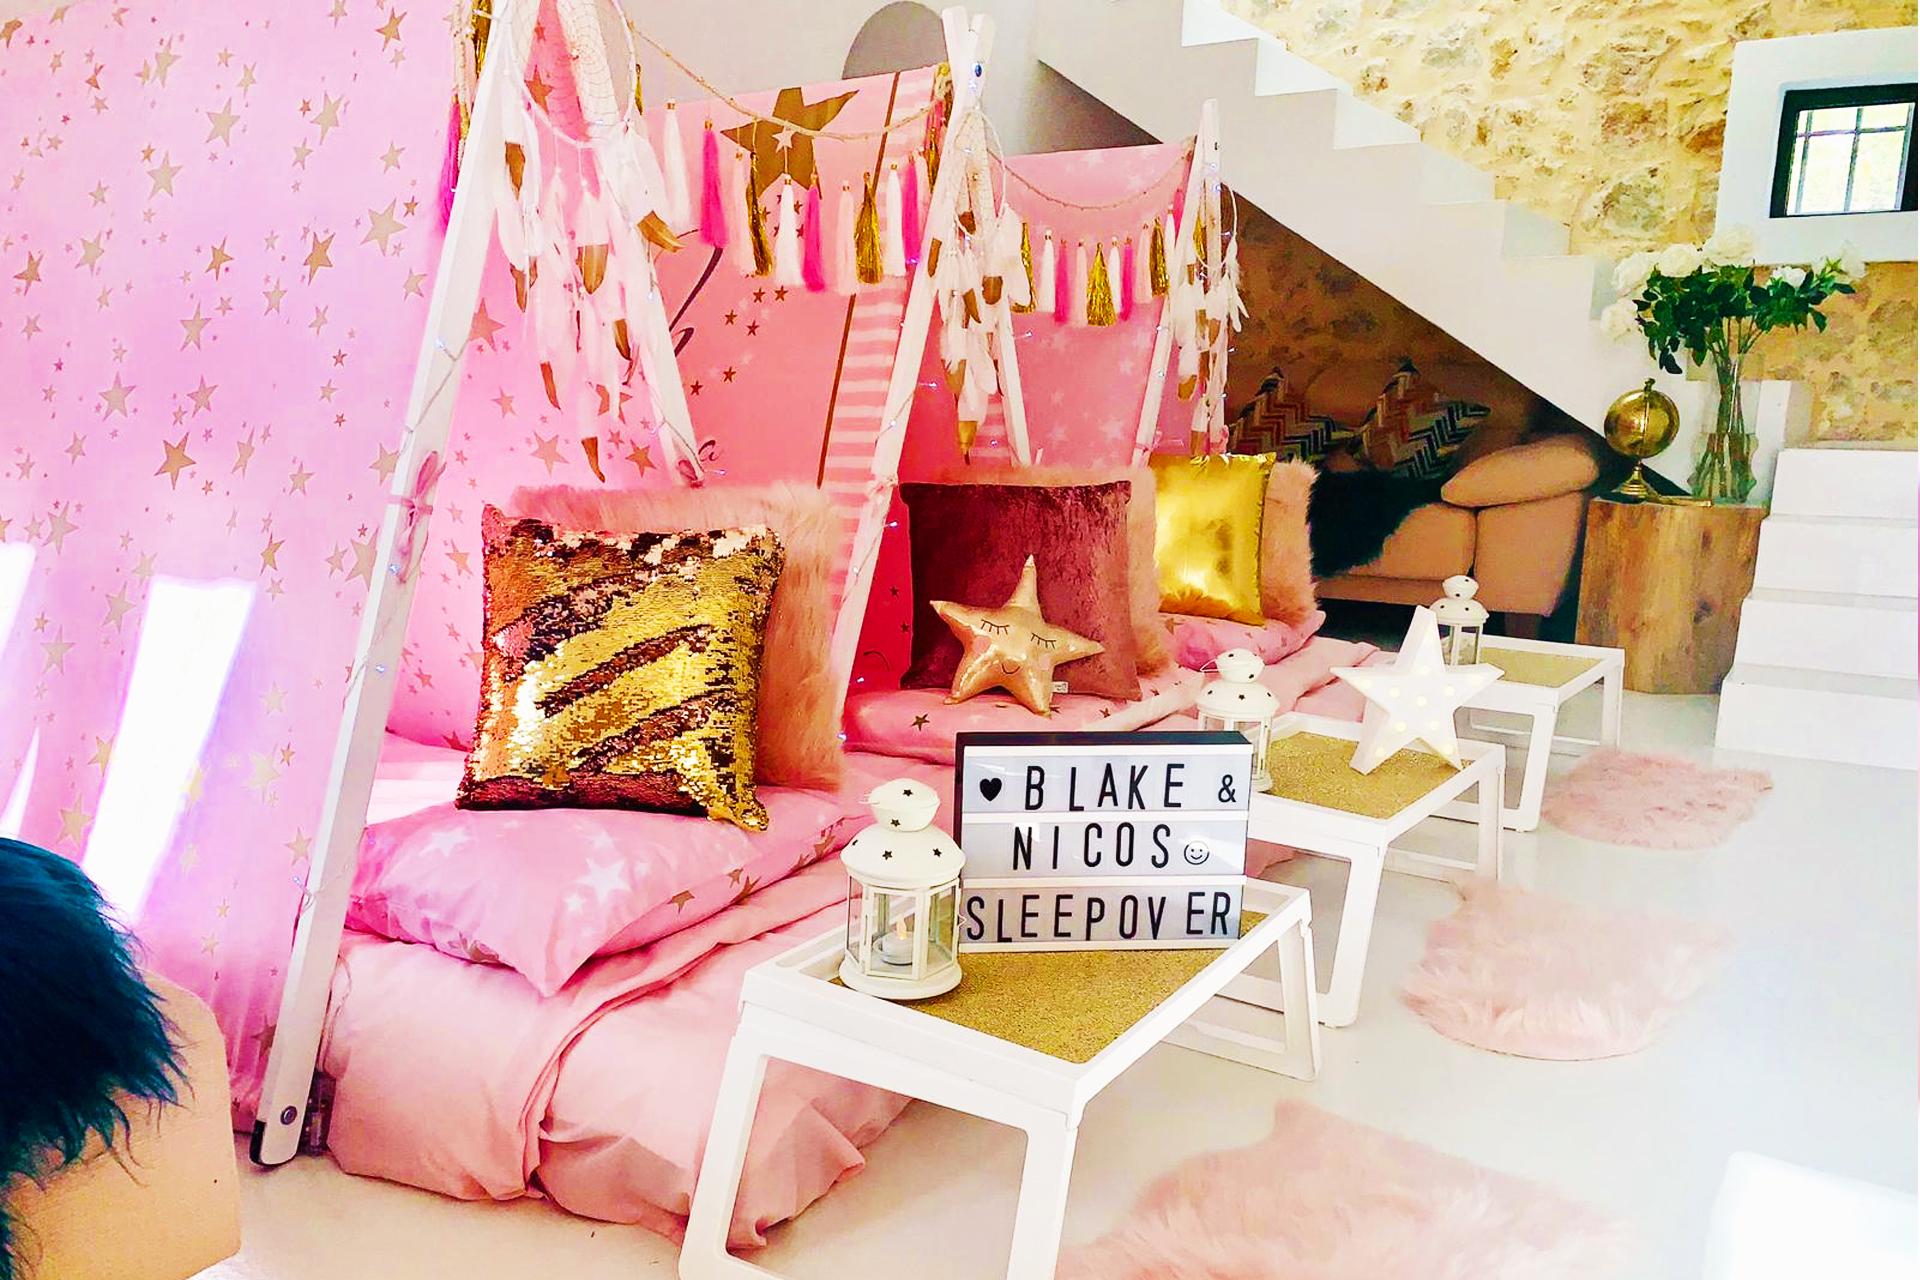 Fairytale Ibiza - Teepee Slumber Party in Ibiza - Wish Upon A Star theme